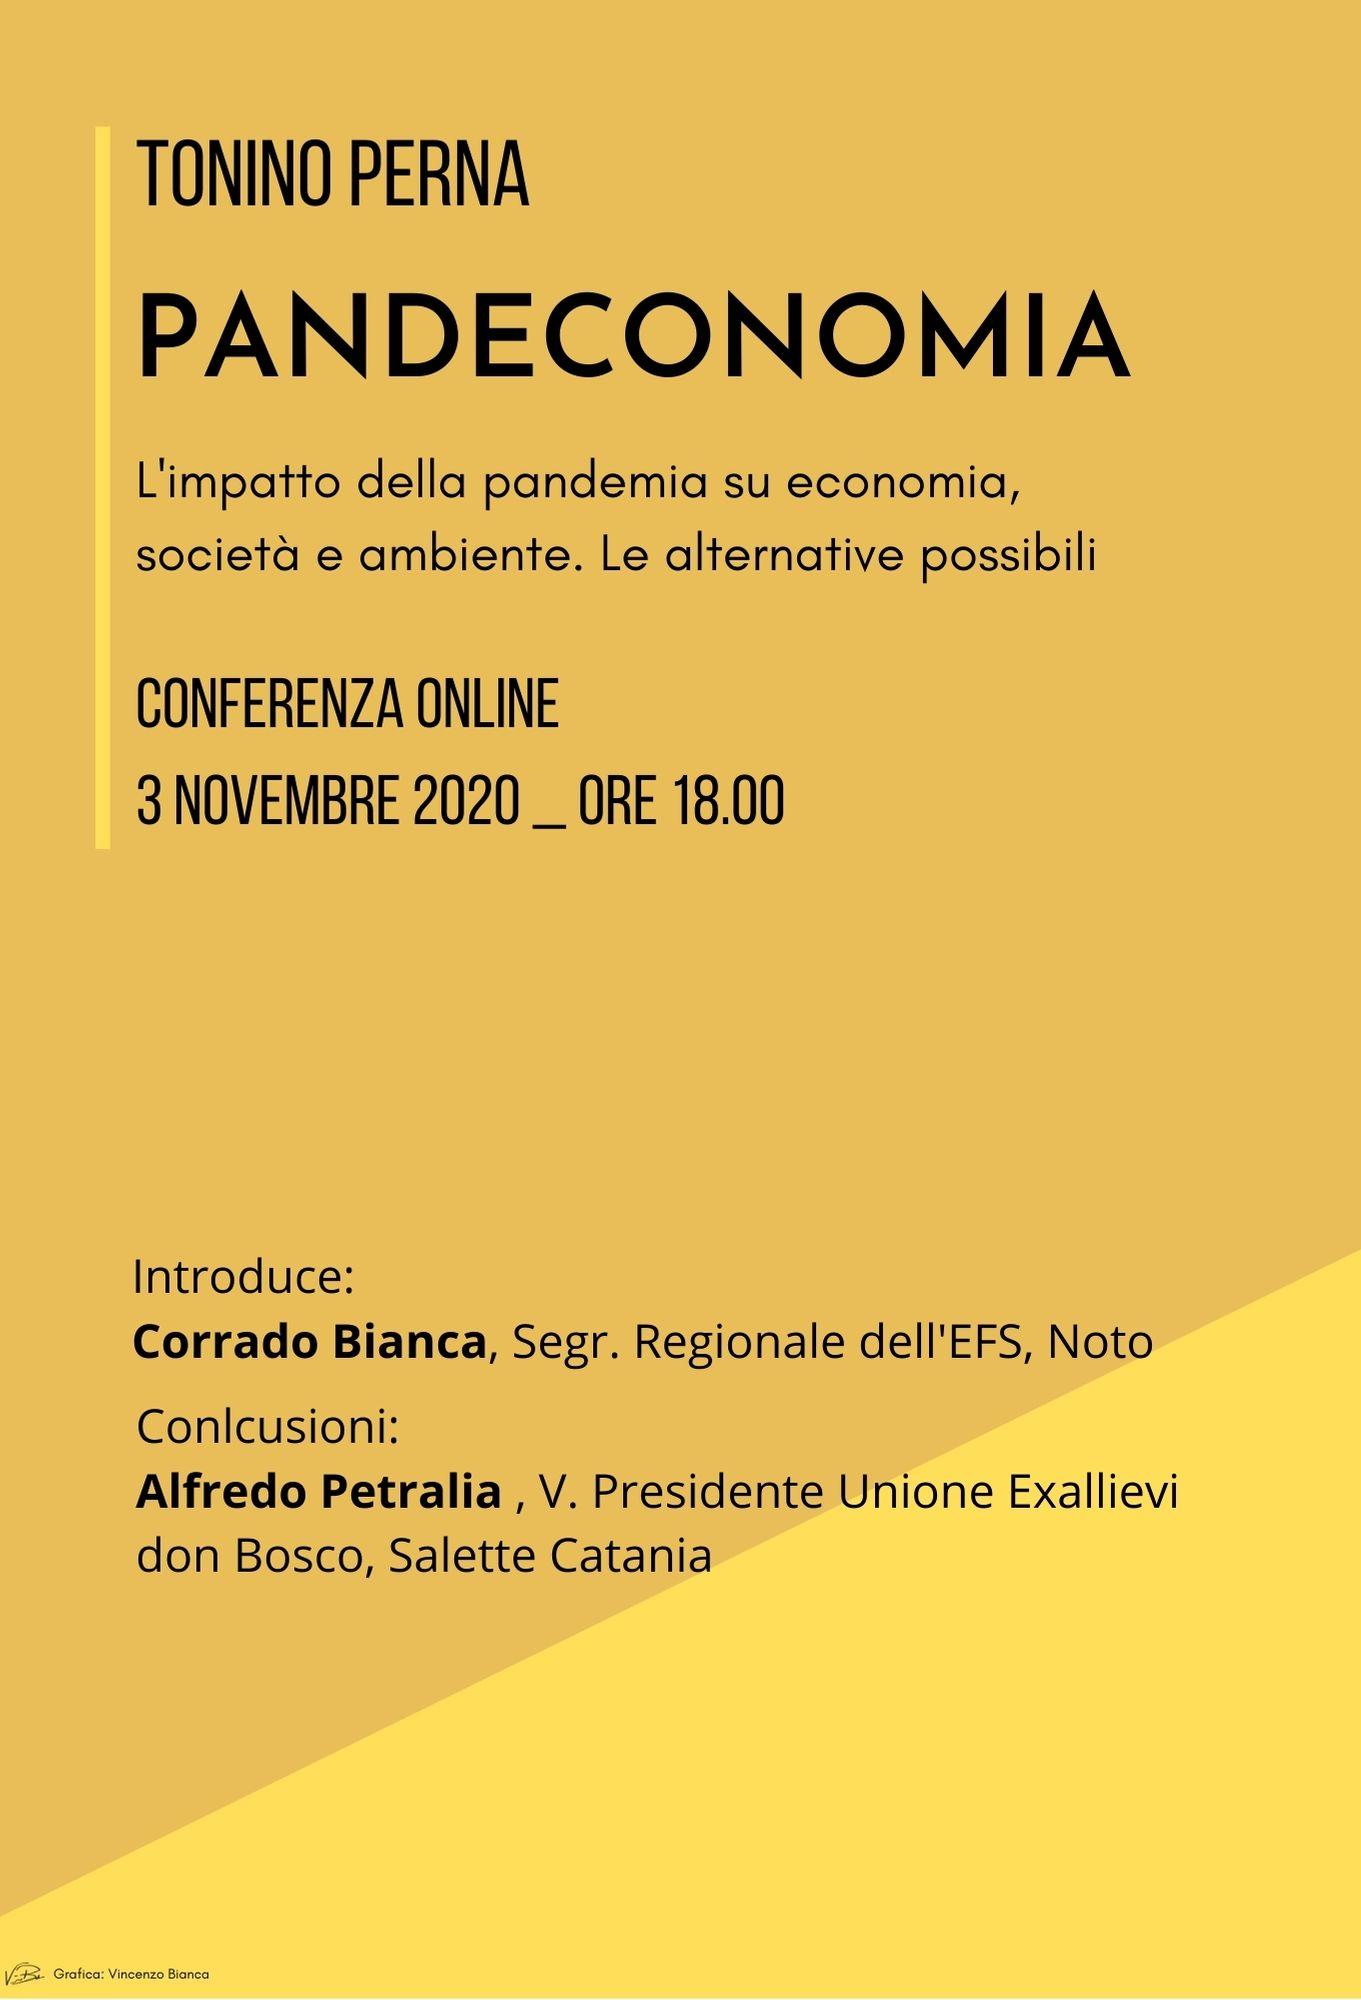 PANDECONOMIA - Tonino Perna (Conferenza Online)